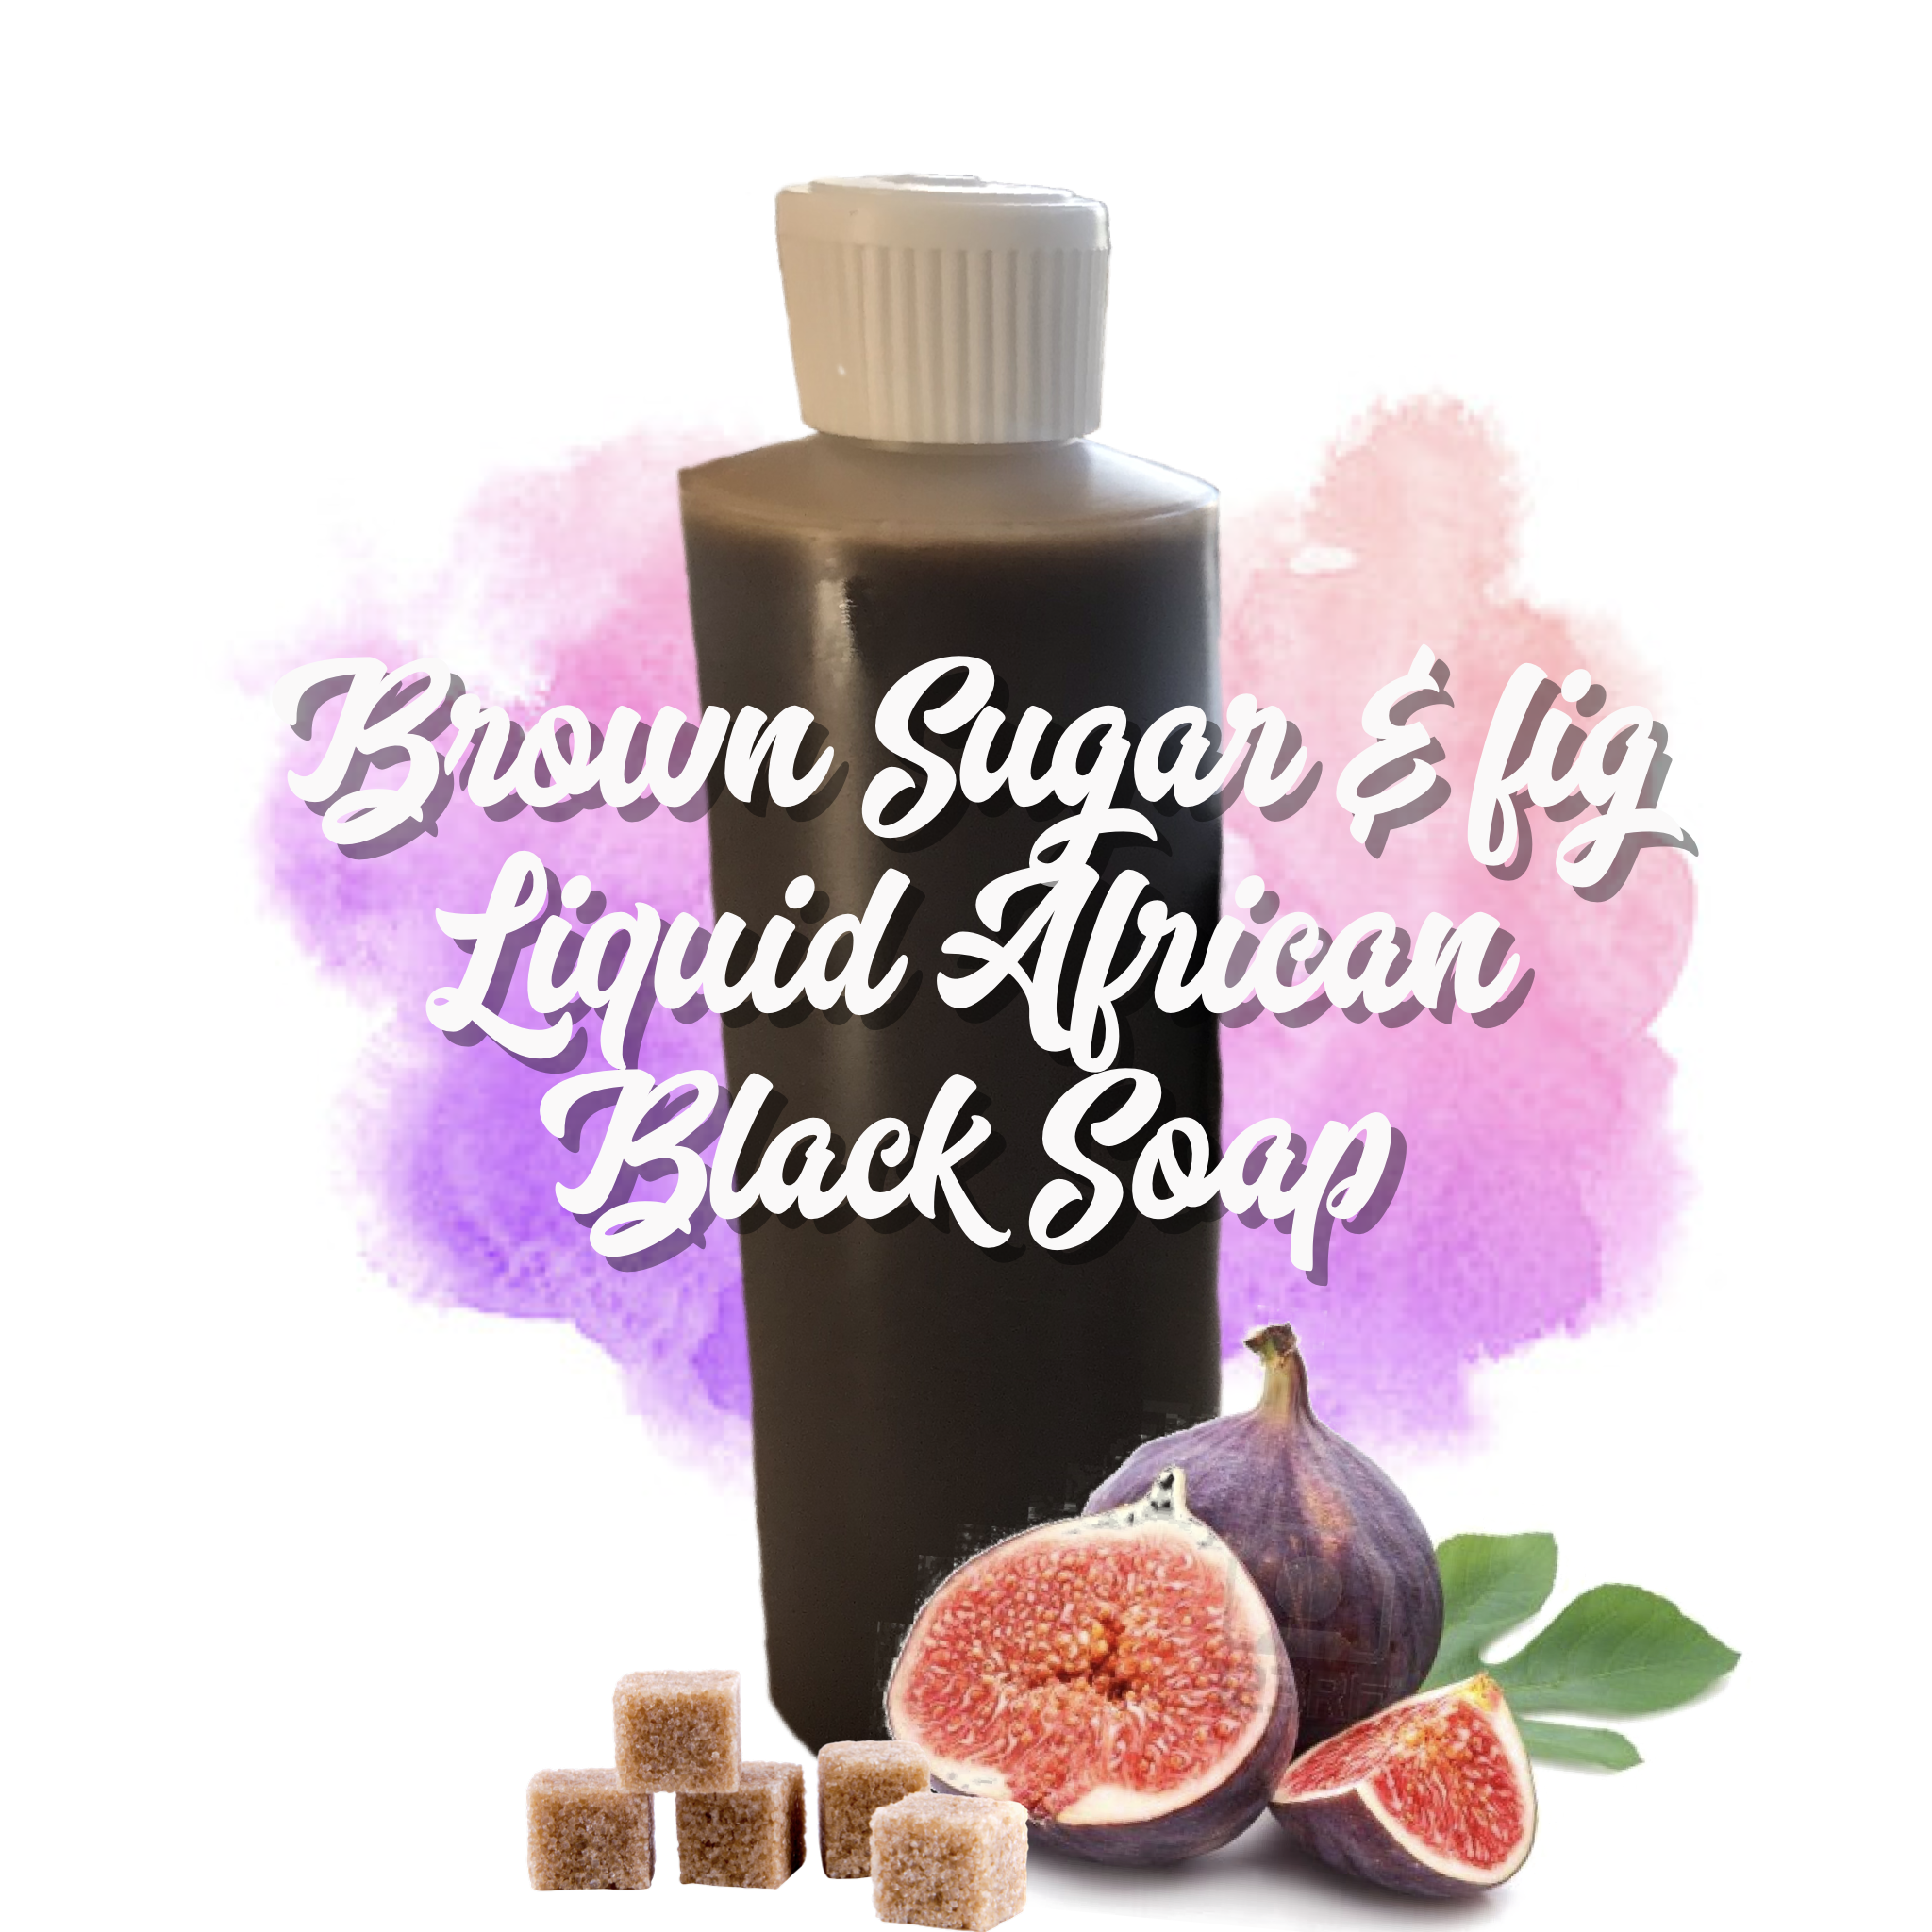 Brown Sugar & Fig Organic Authentic Liquid African Black